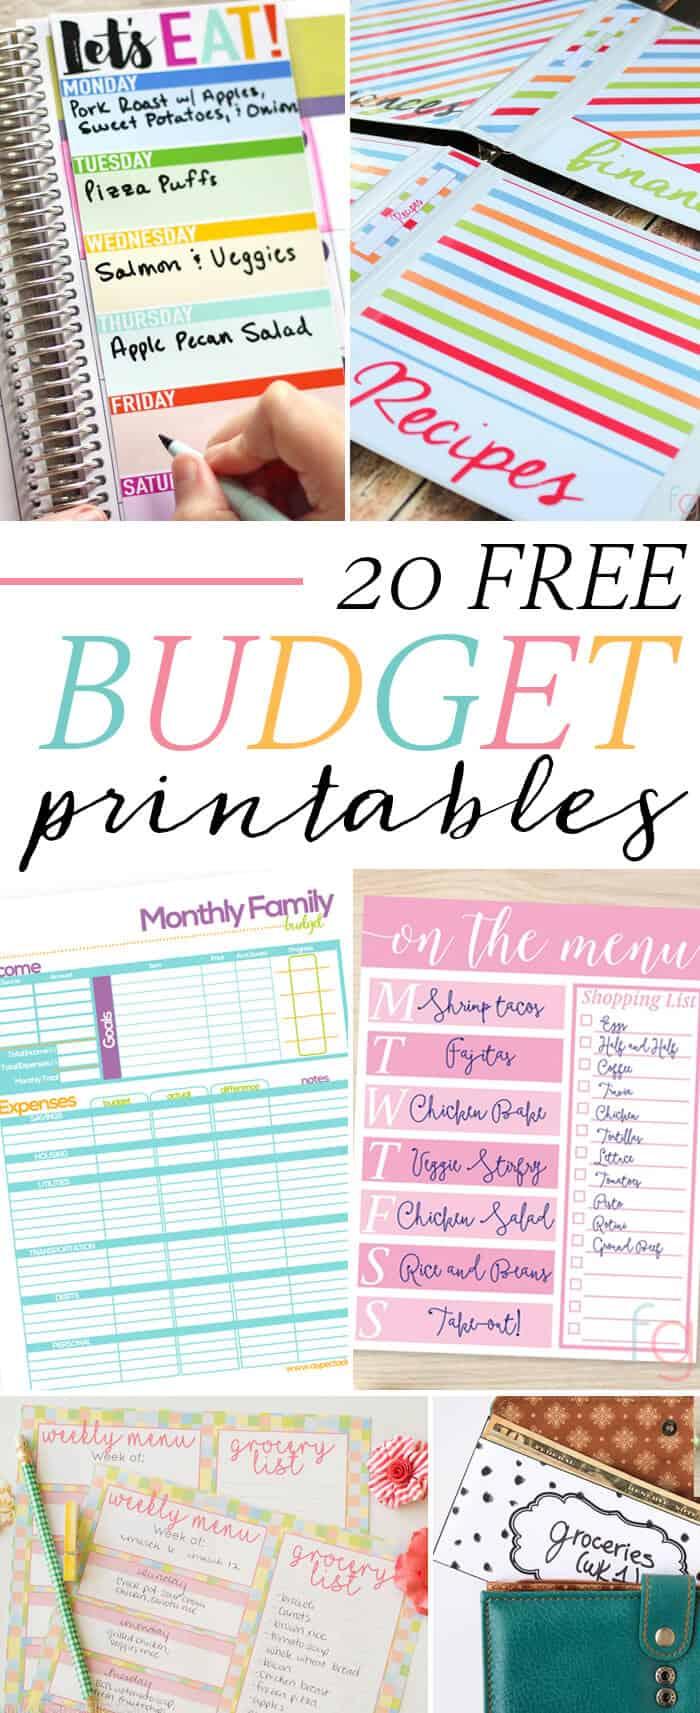 free-budget-printables